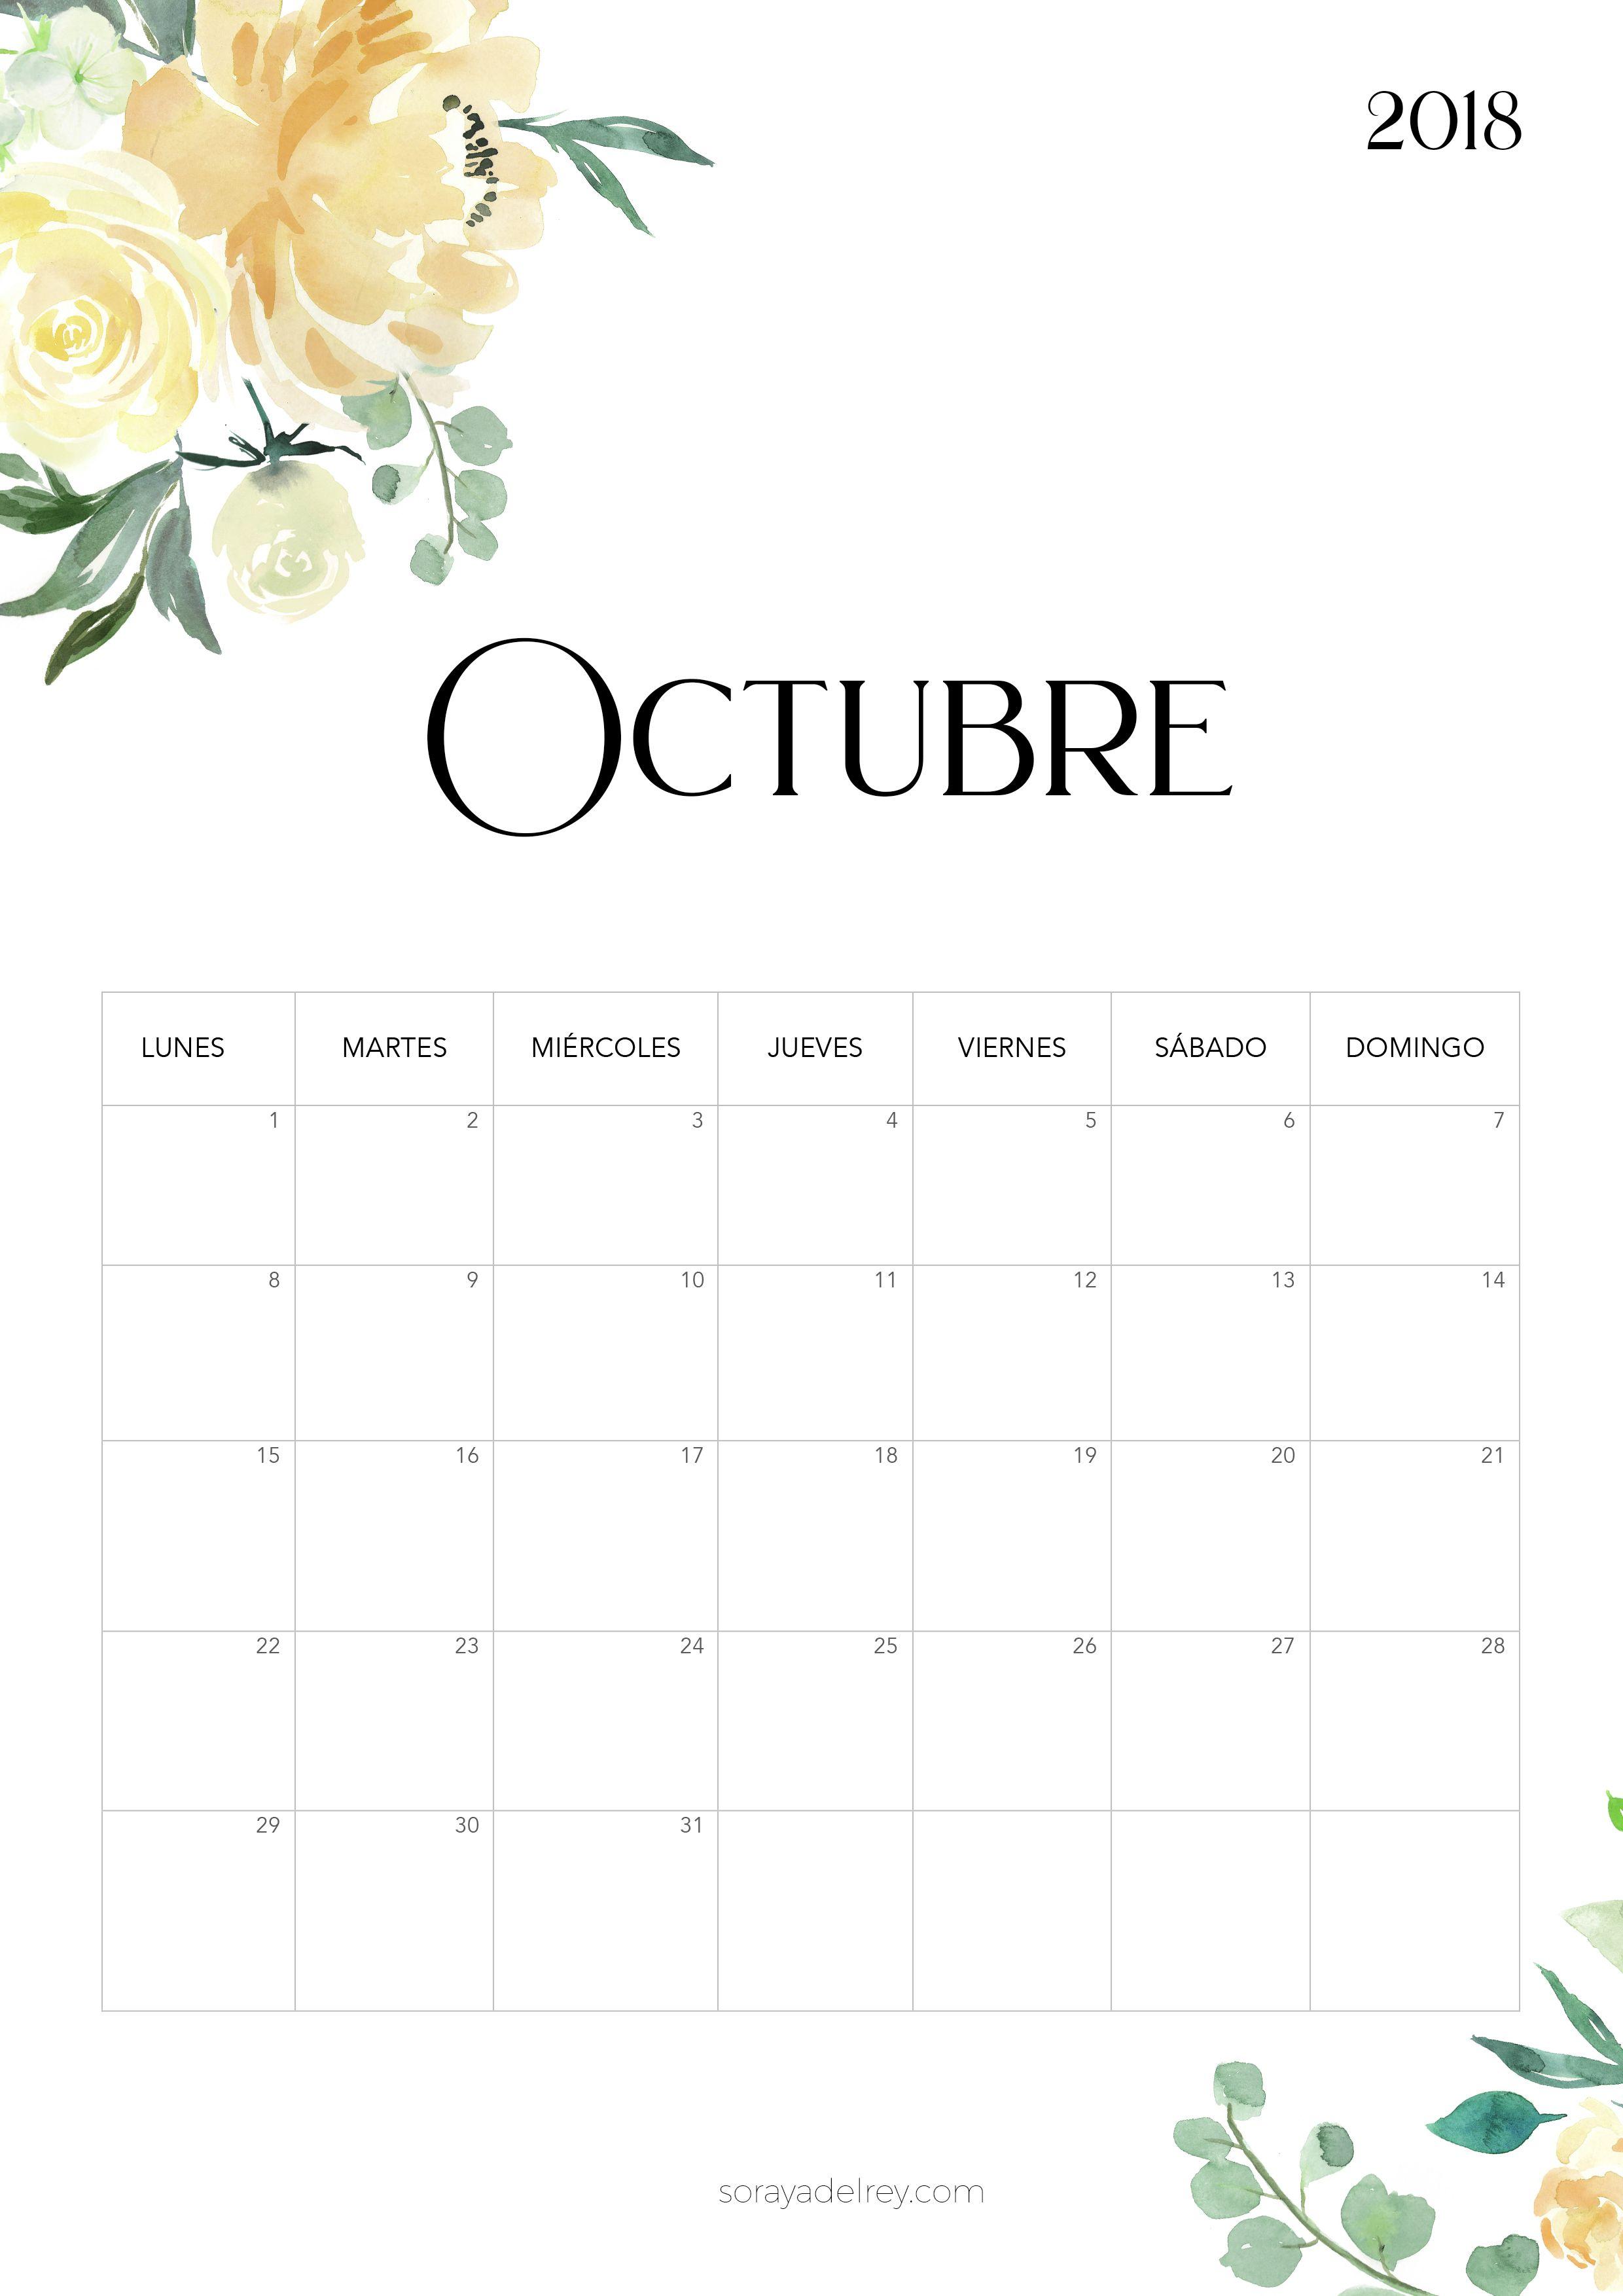 Semana Calendario.Calendario Para Imprimir 2018 2019 Costurero Calendario Para